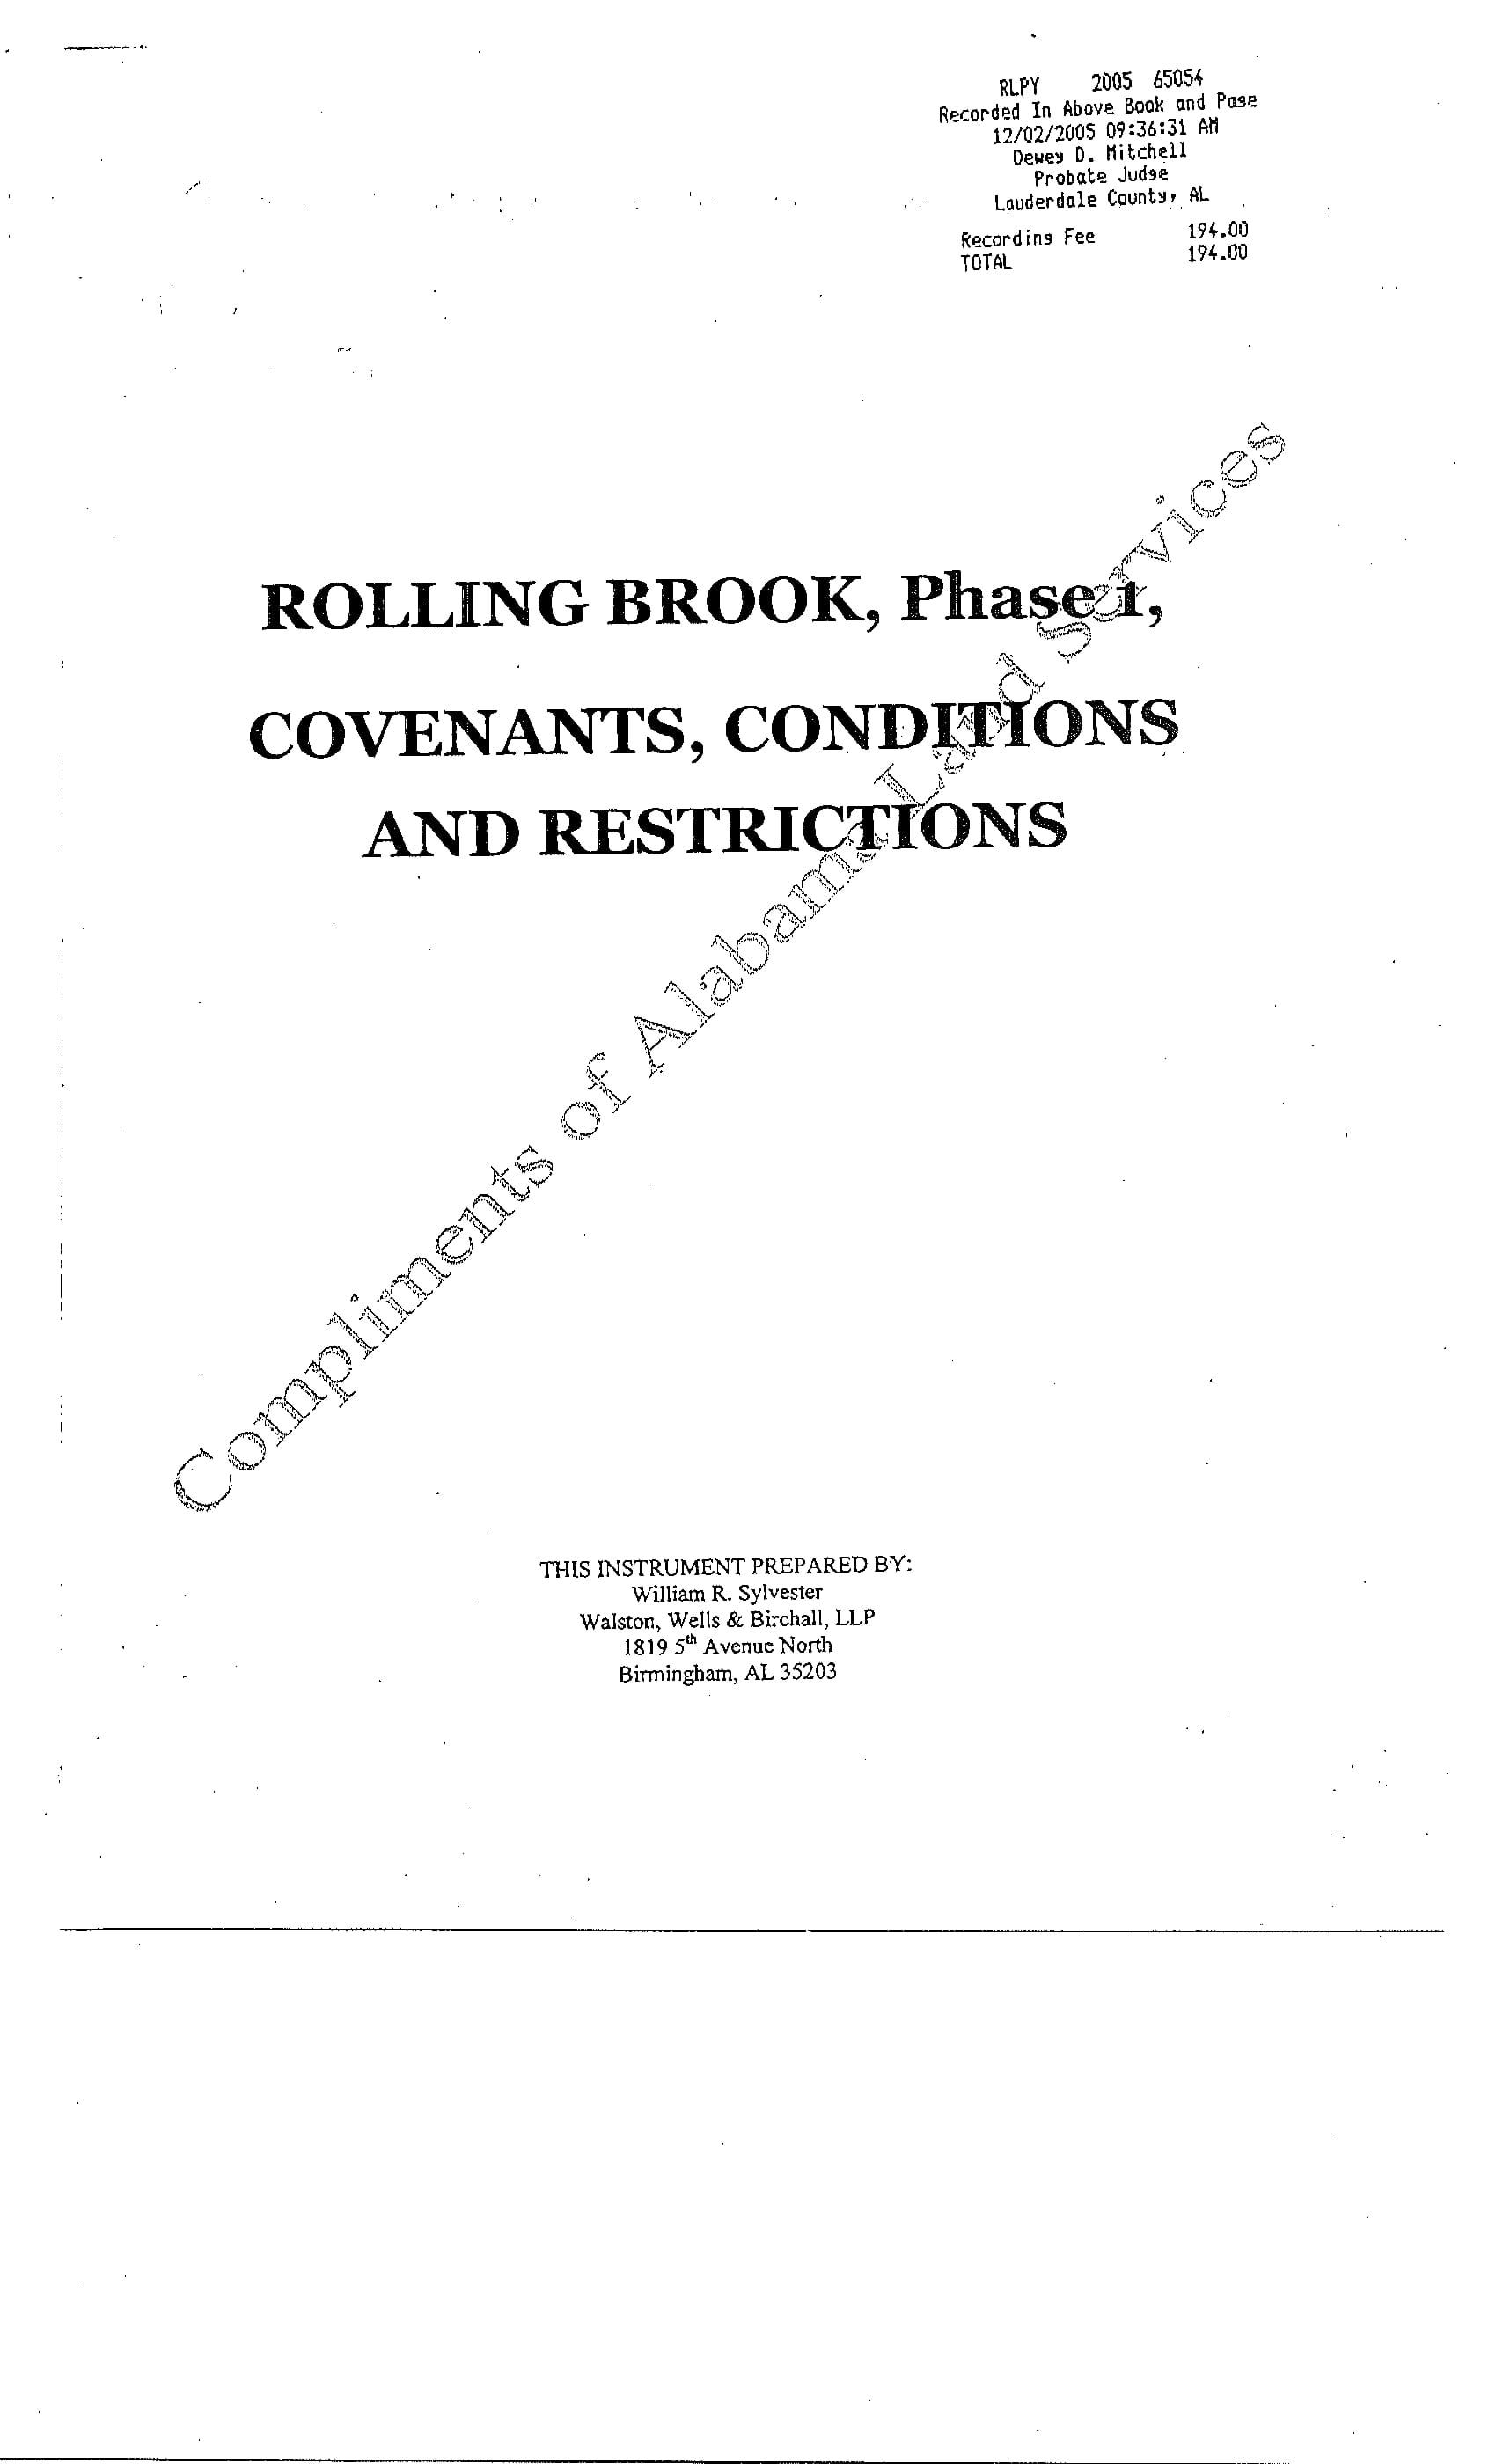 Covenants-Rolling-Brook-Phase-1-01.jpg